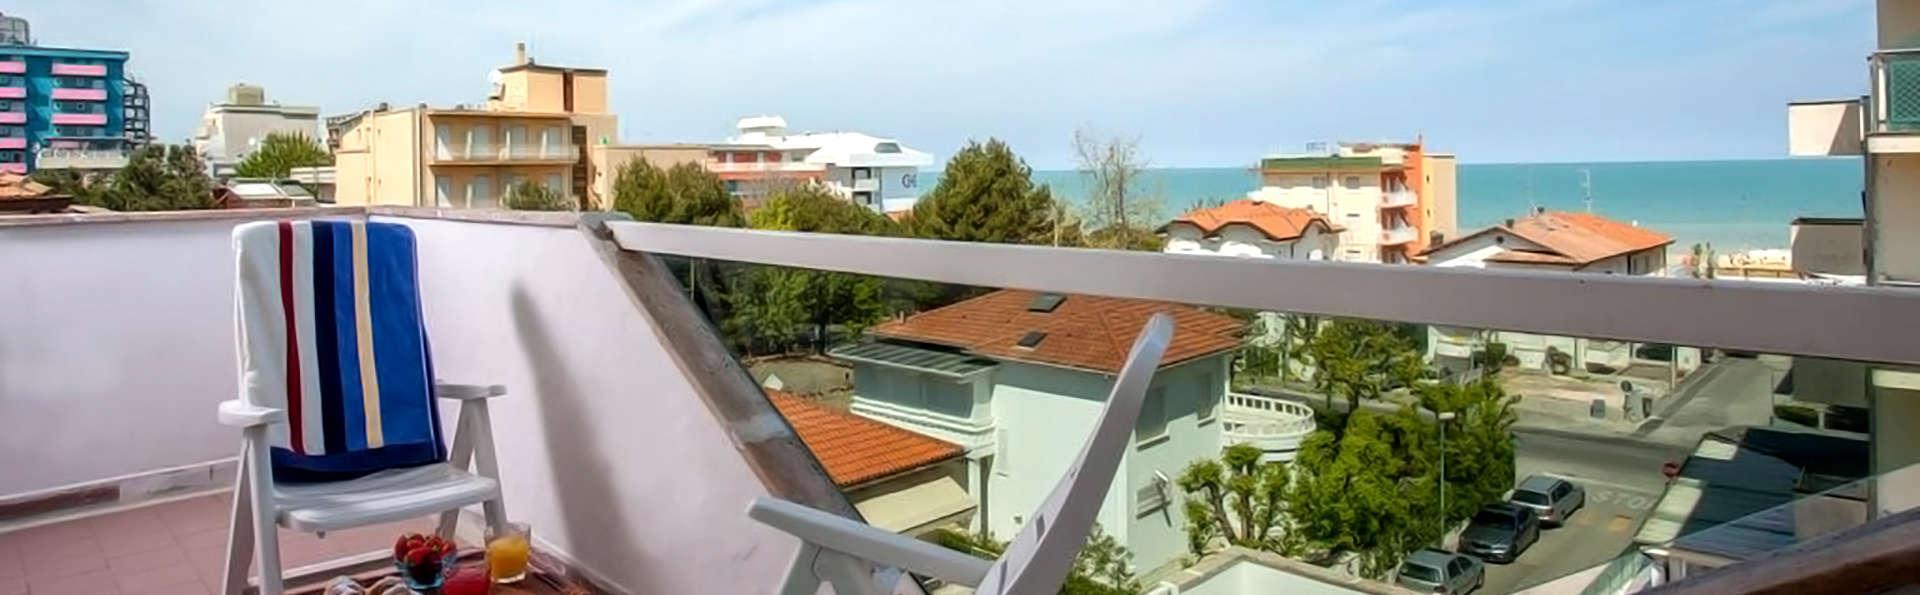 Hotel Villa Lina - Edit_Terrace.jpg